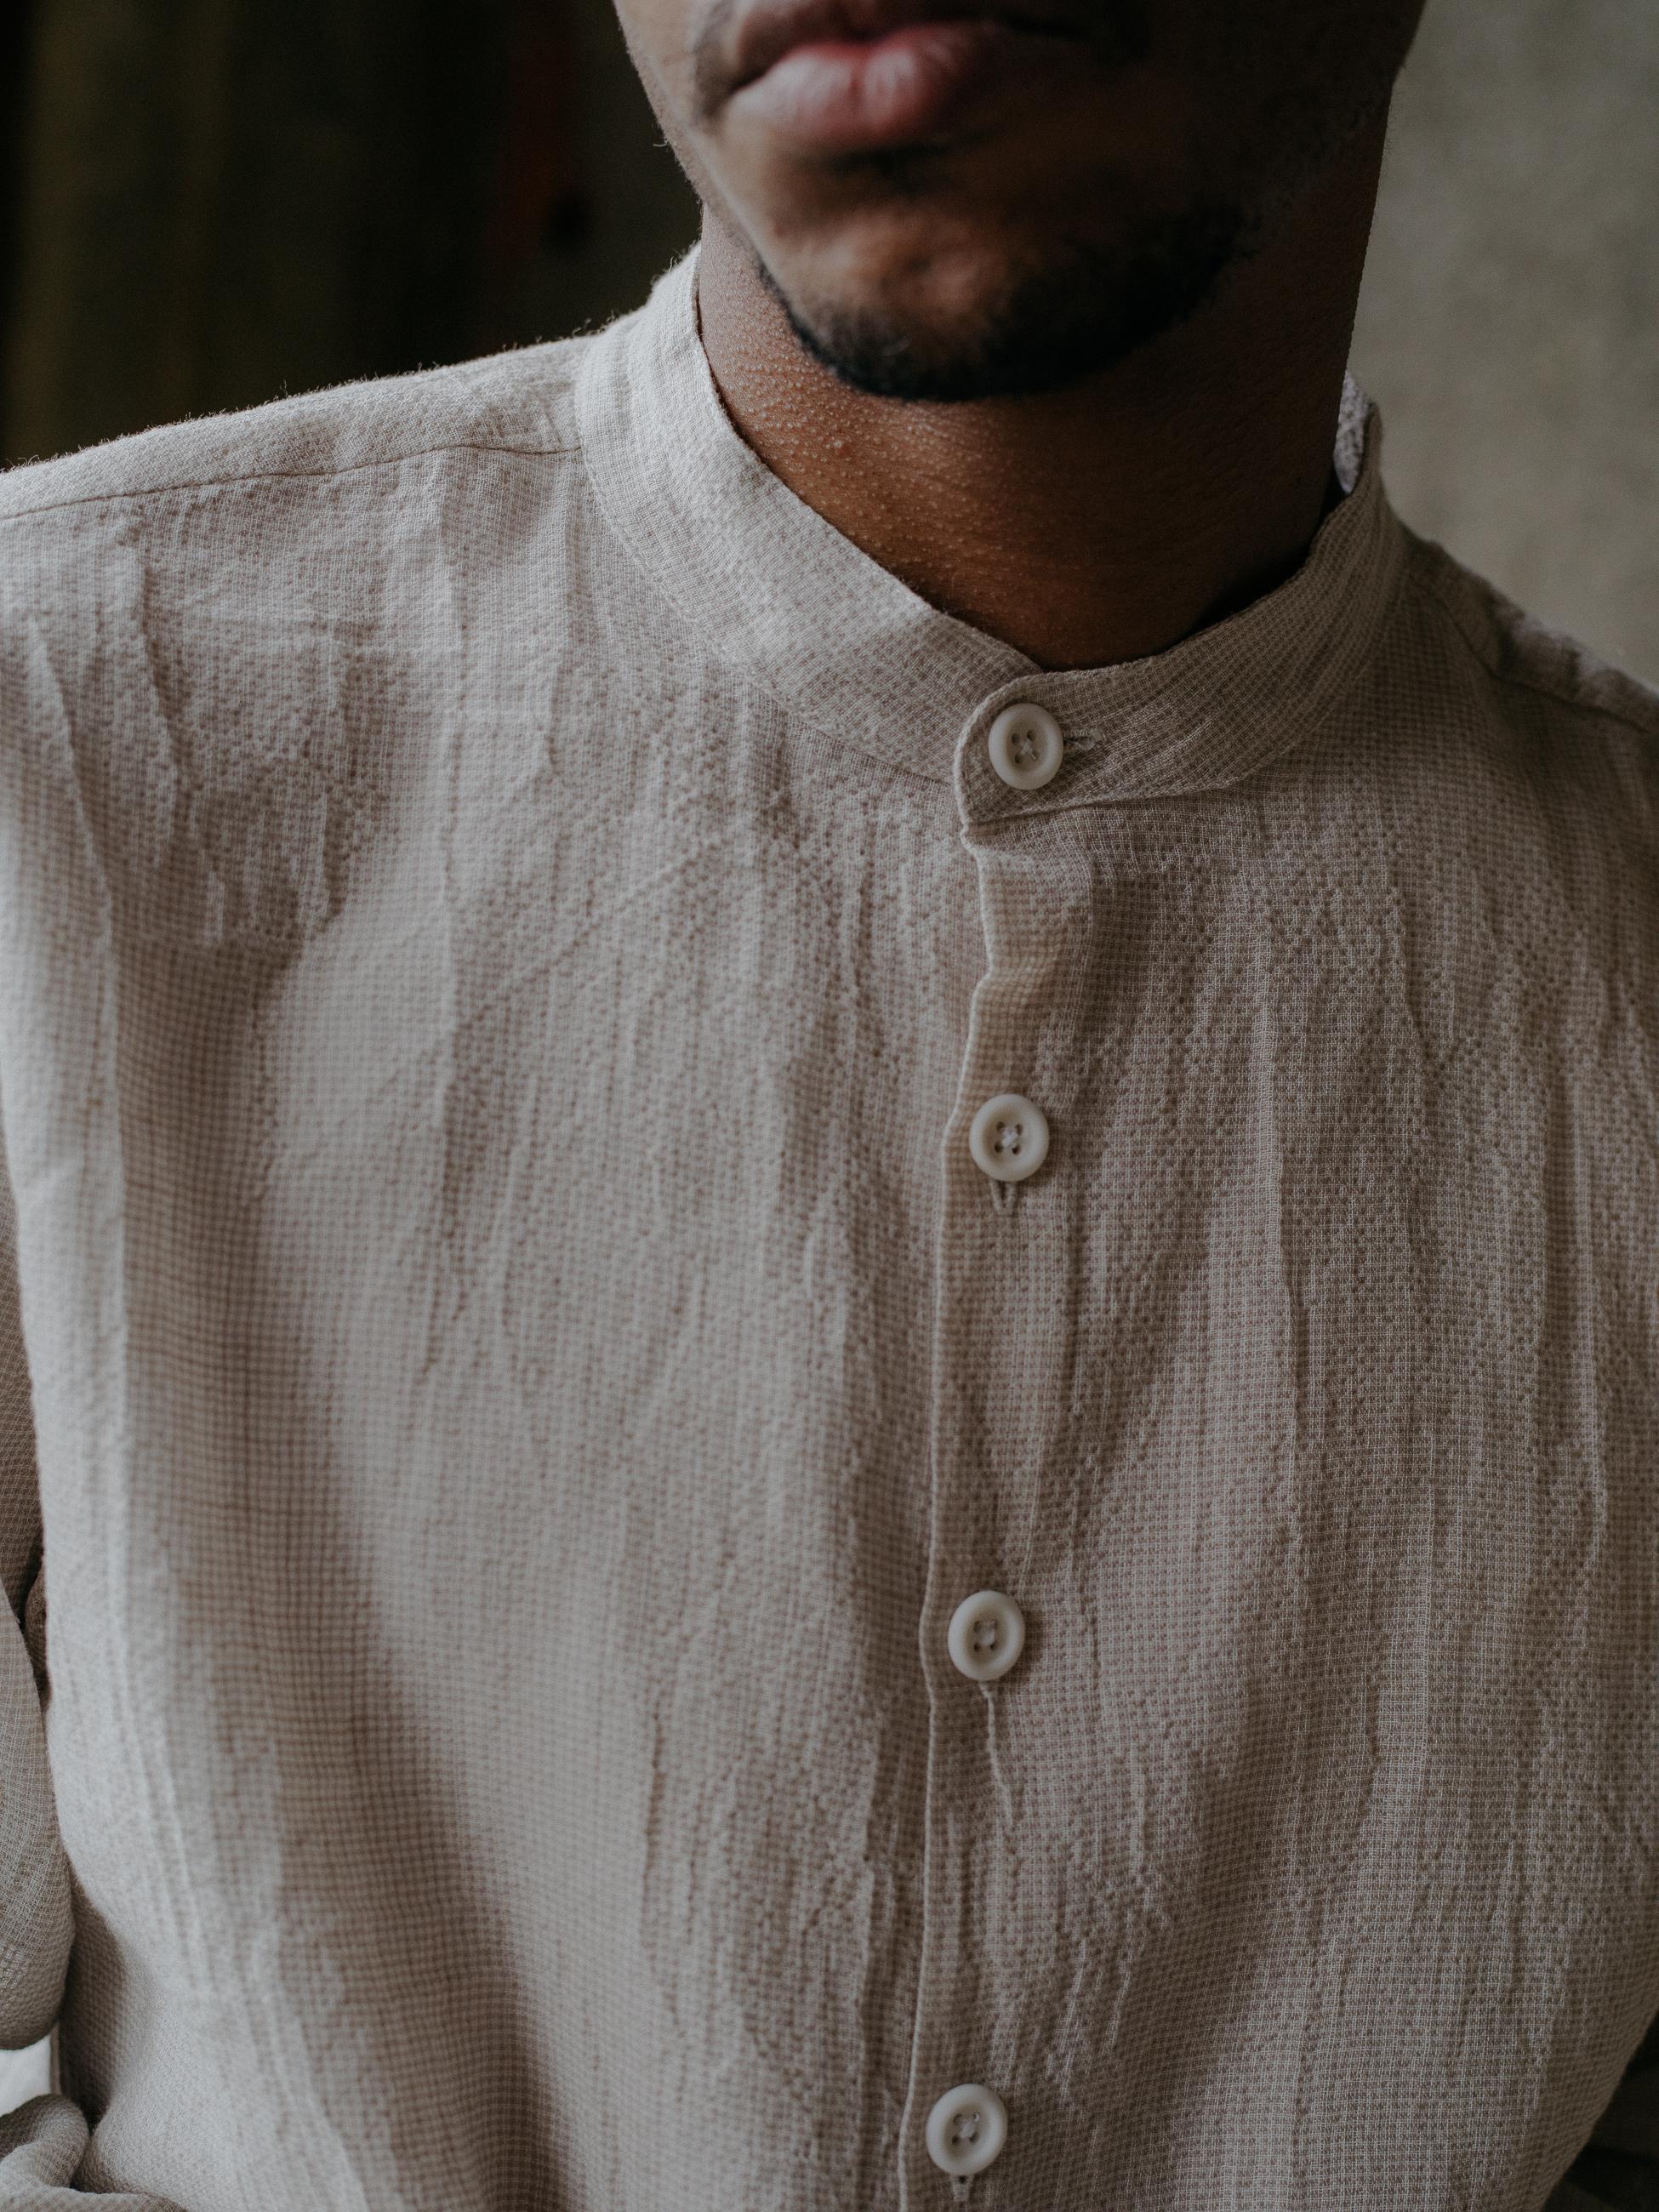 evan-kinori-band-collar-shirt-linen-4